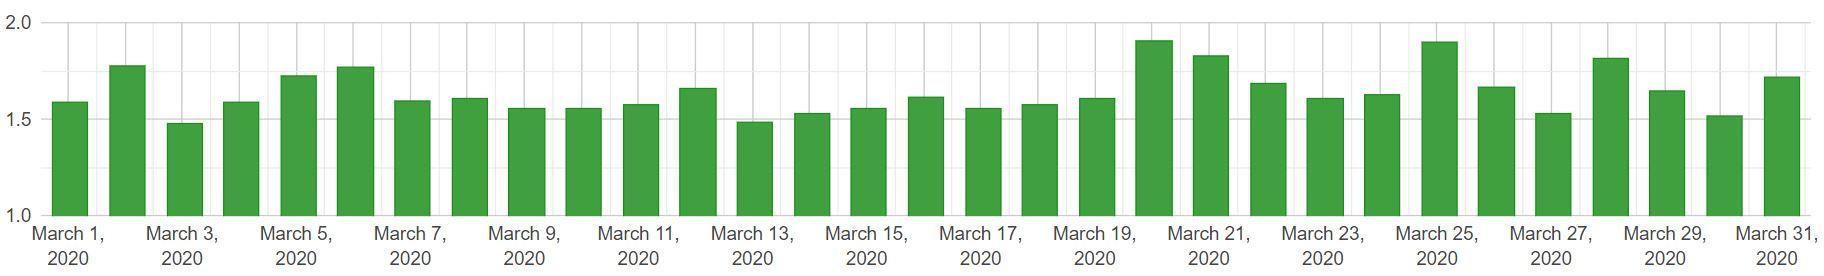 zmiany w SERP desktop - marzec 2020